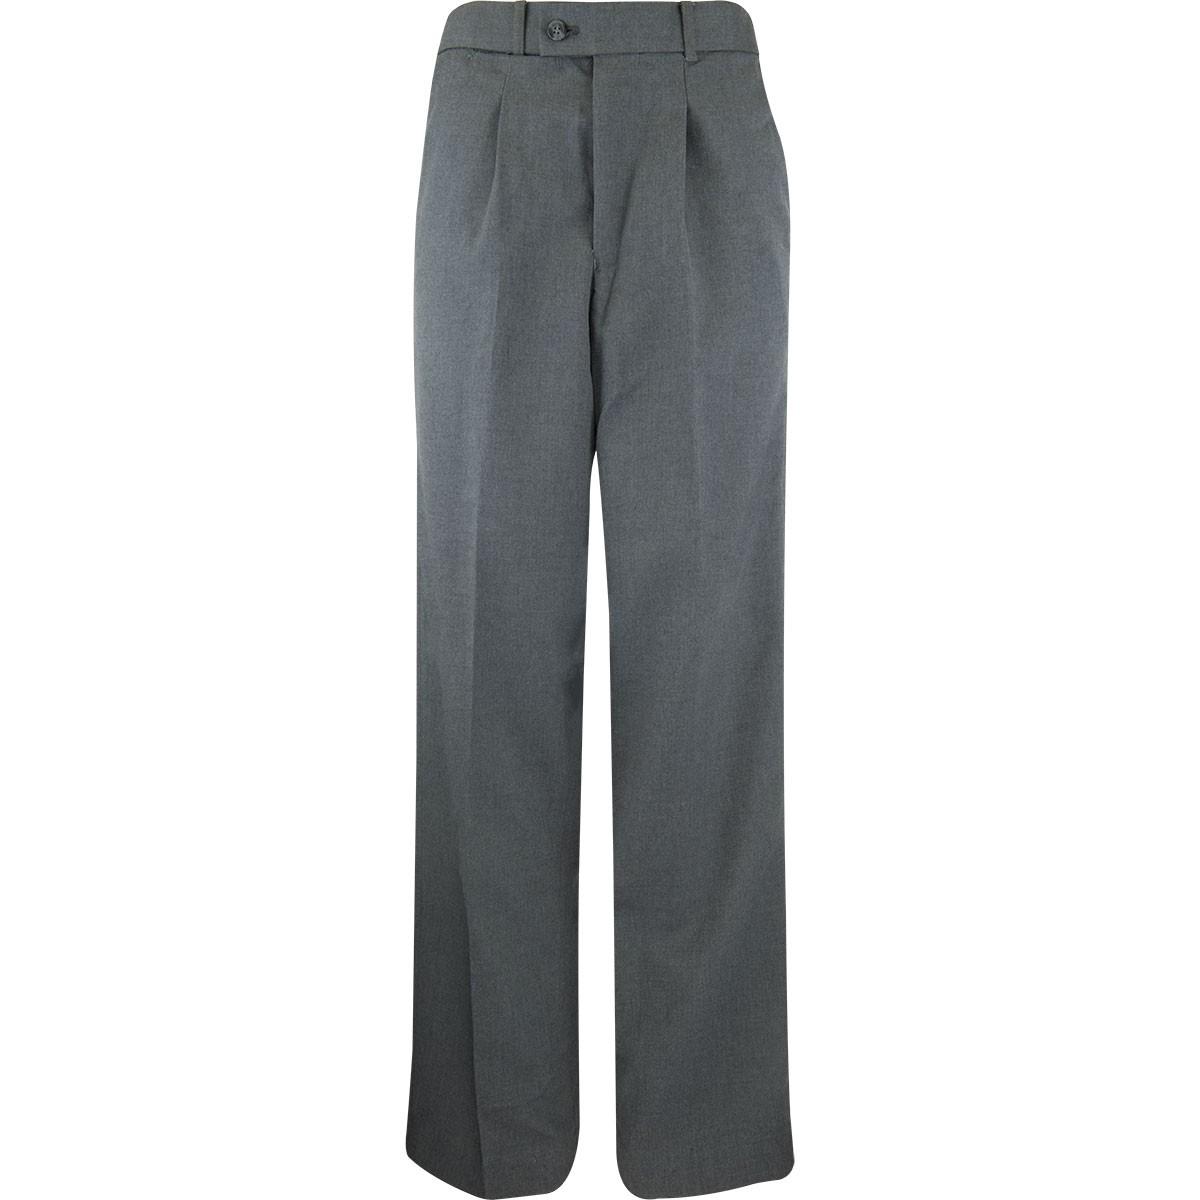 winter uniform boys formal trousers the school locker. Black Bedroom Furniture Sets. Home Design Ideas